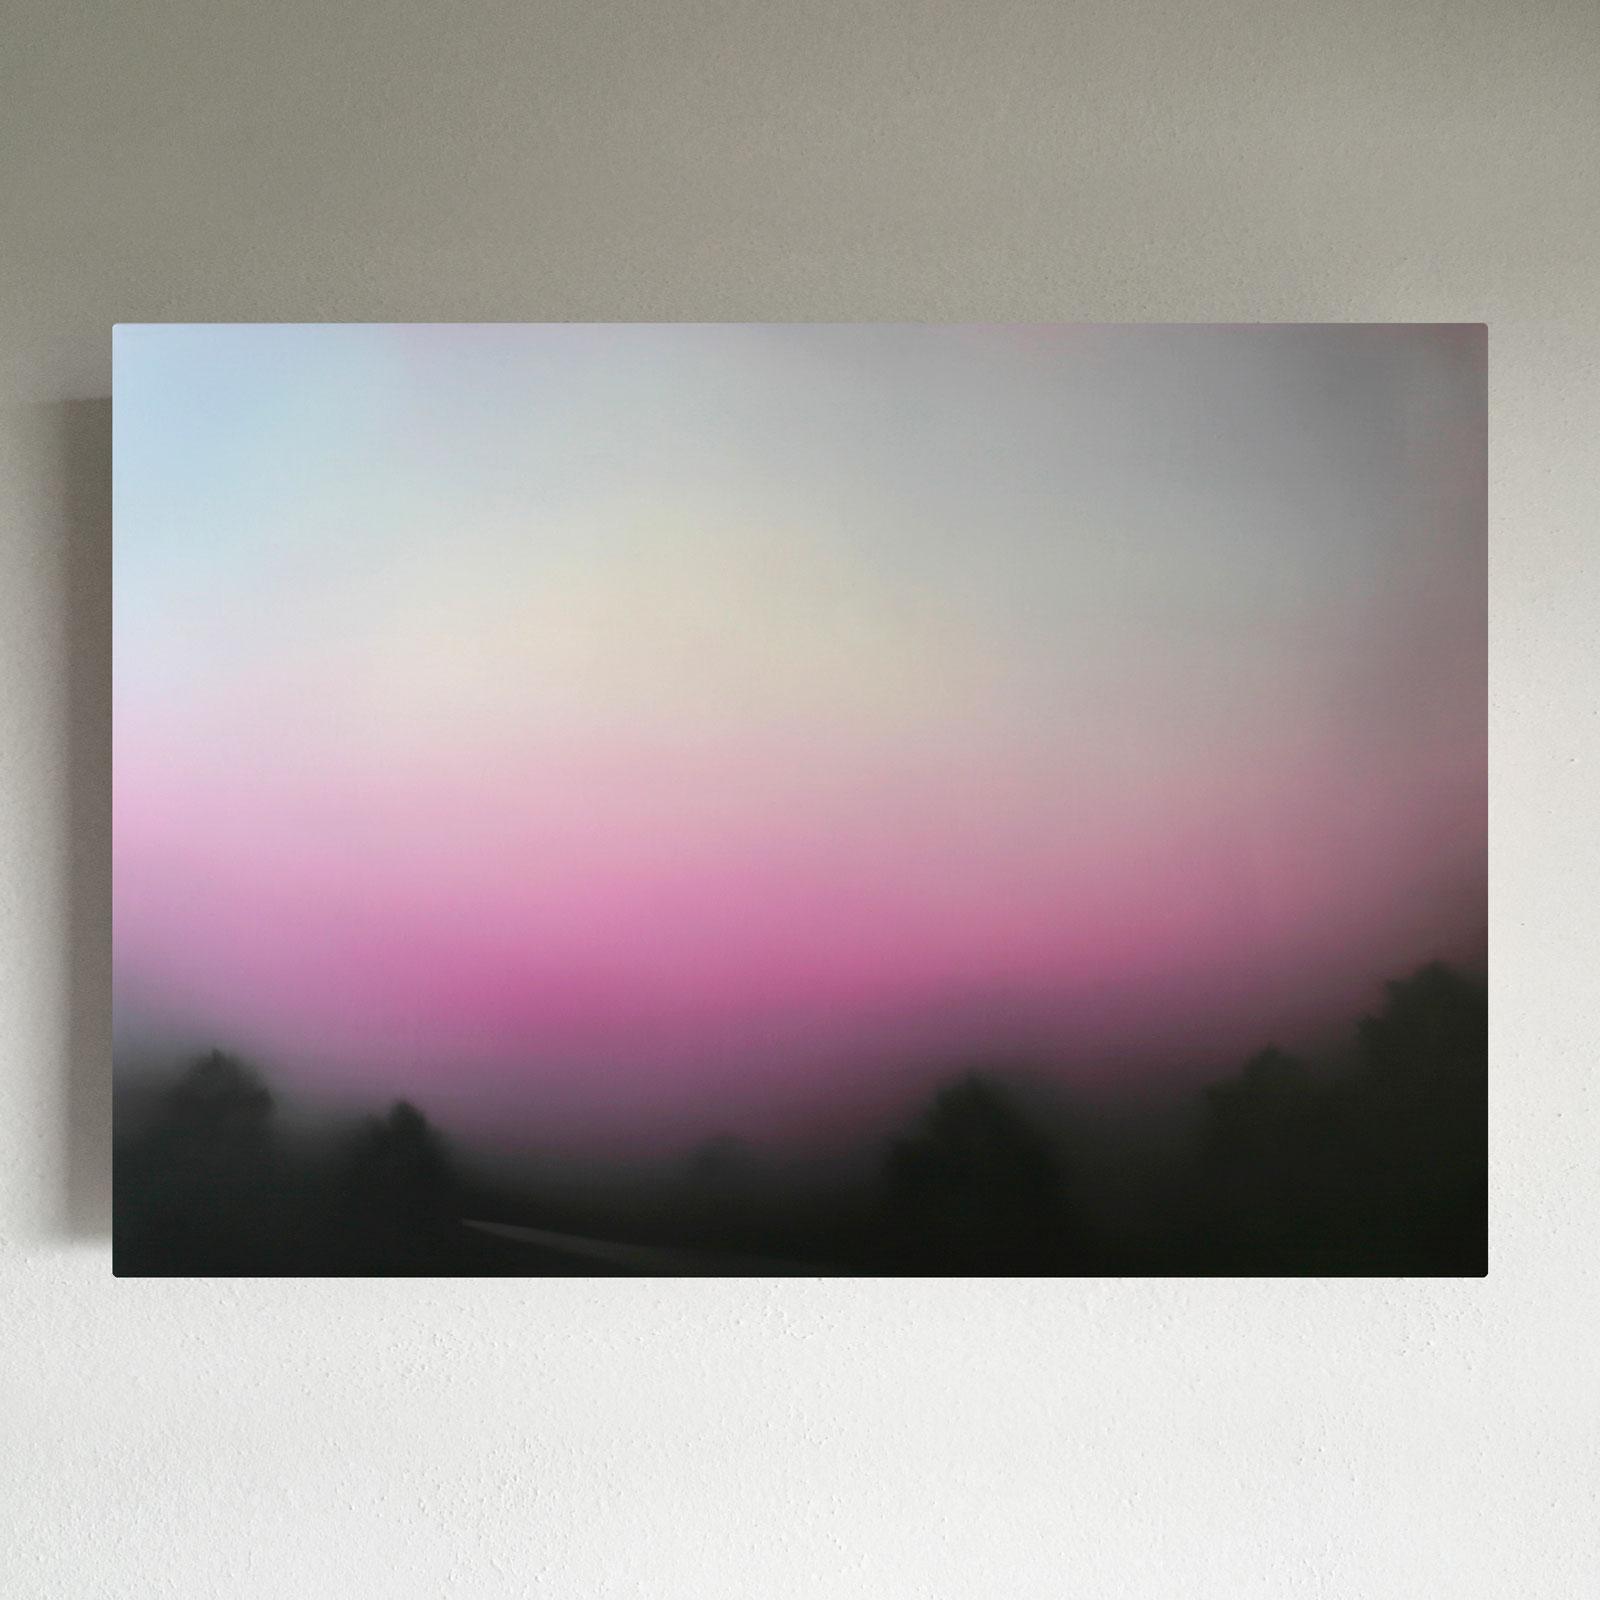 T#79-2011, oil on canvas, 100x140cm, private. coll.